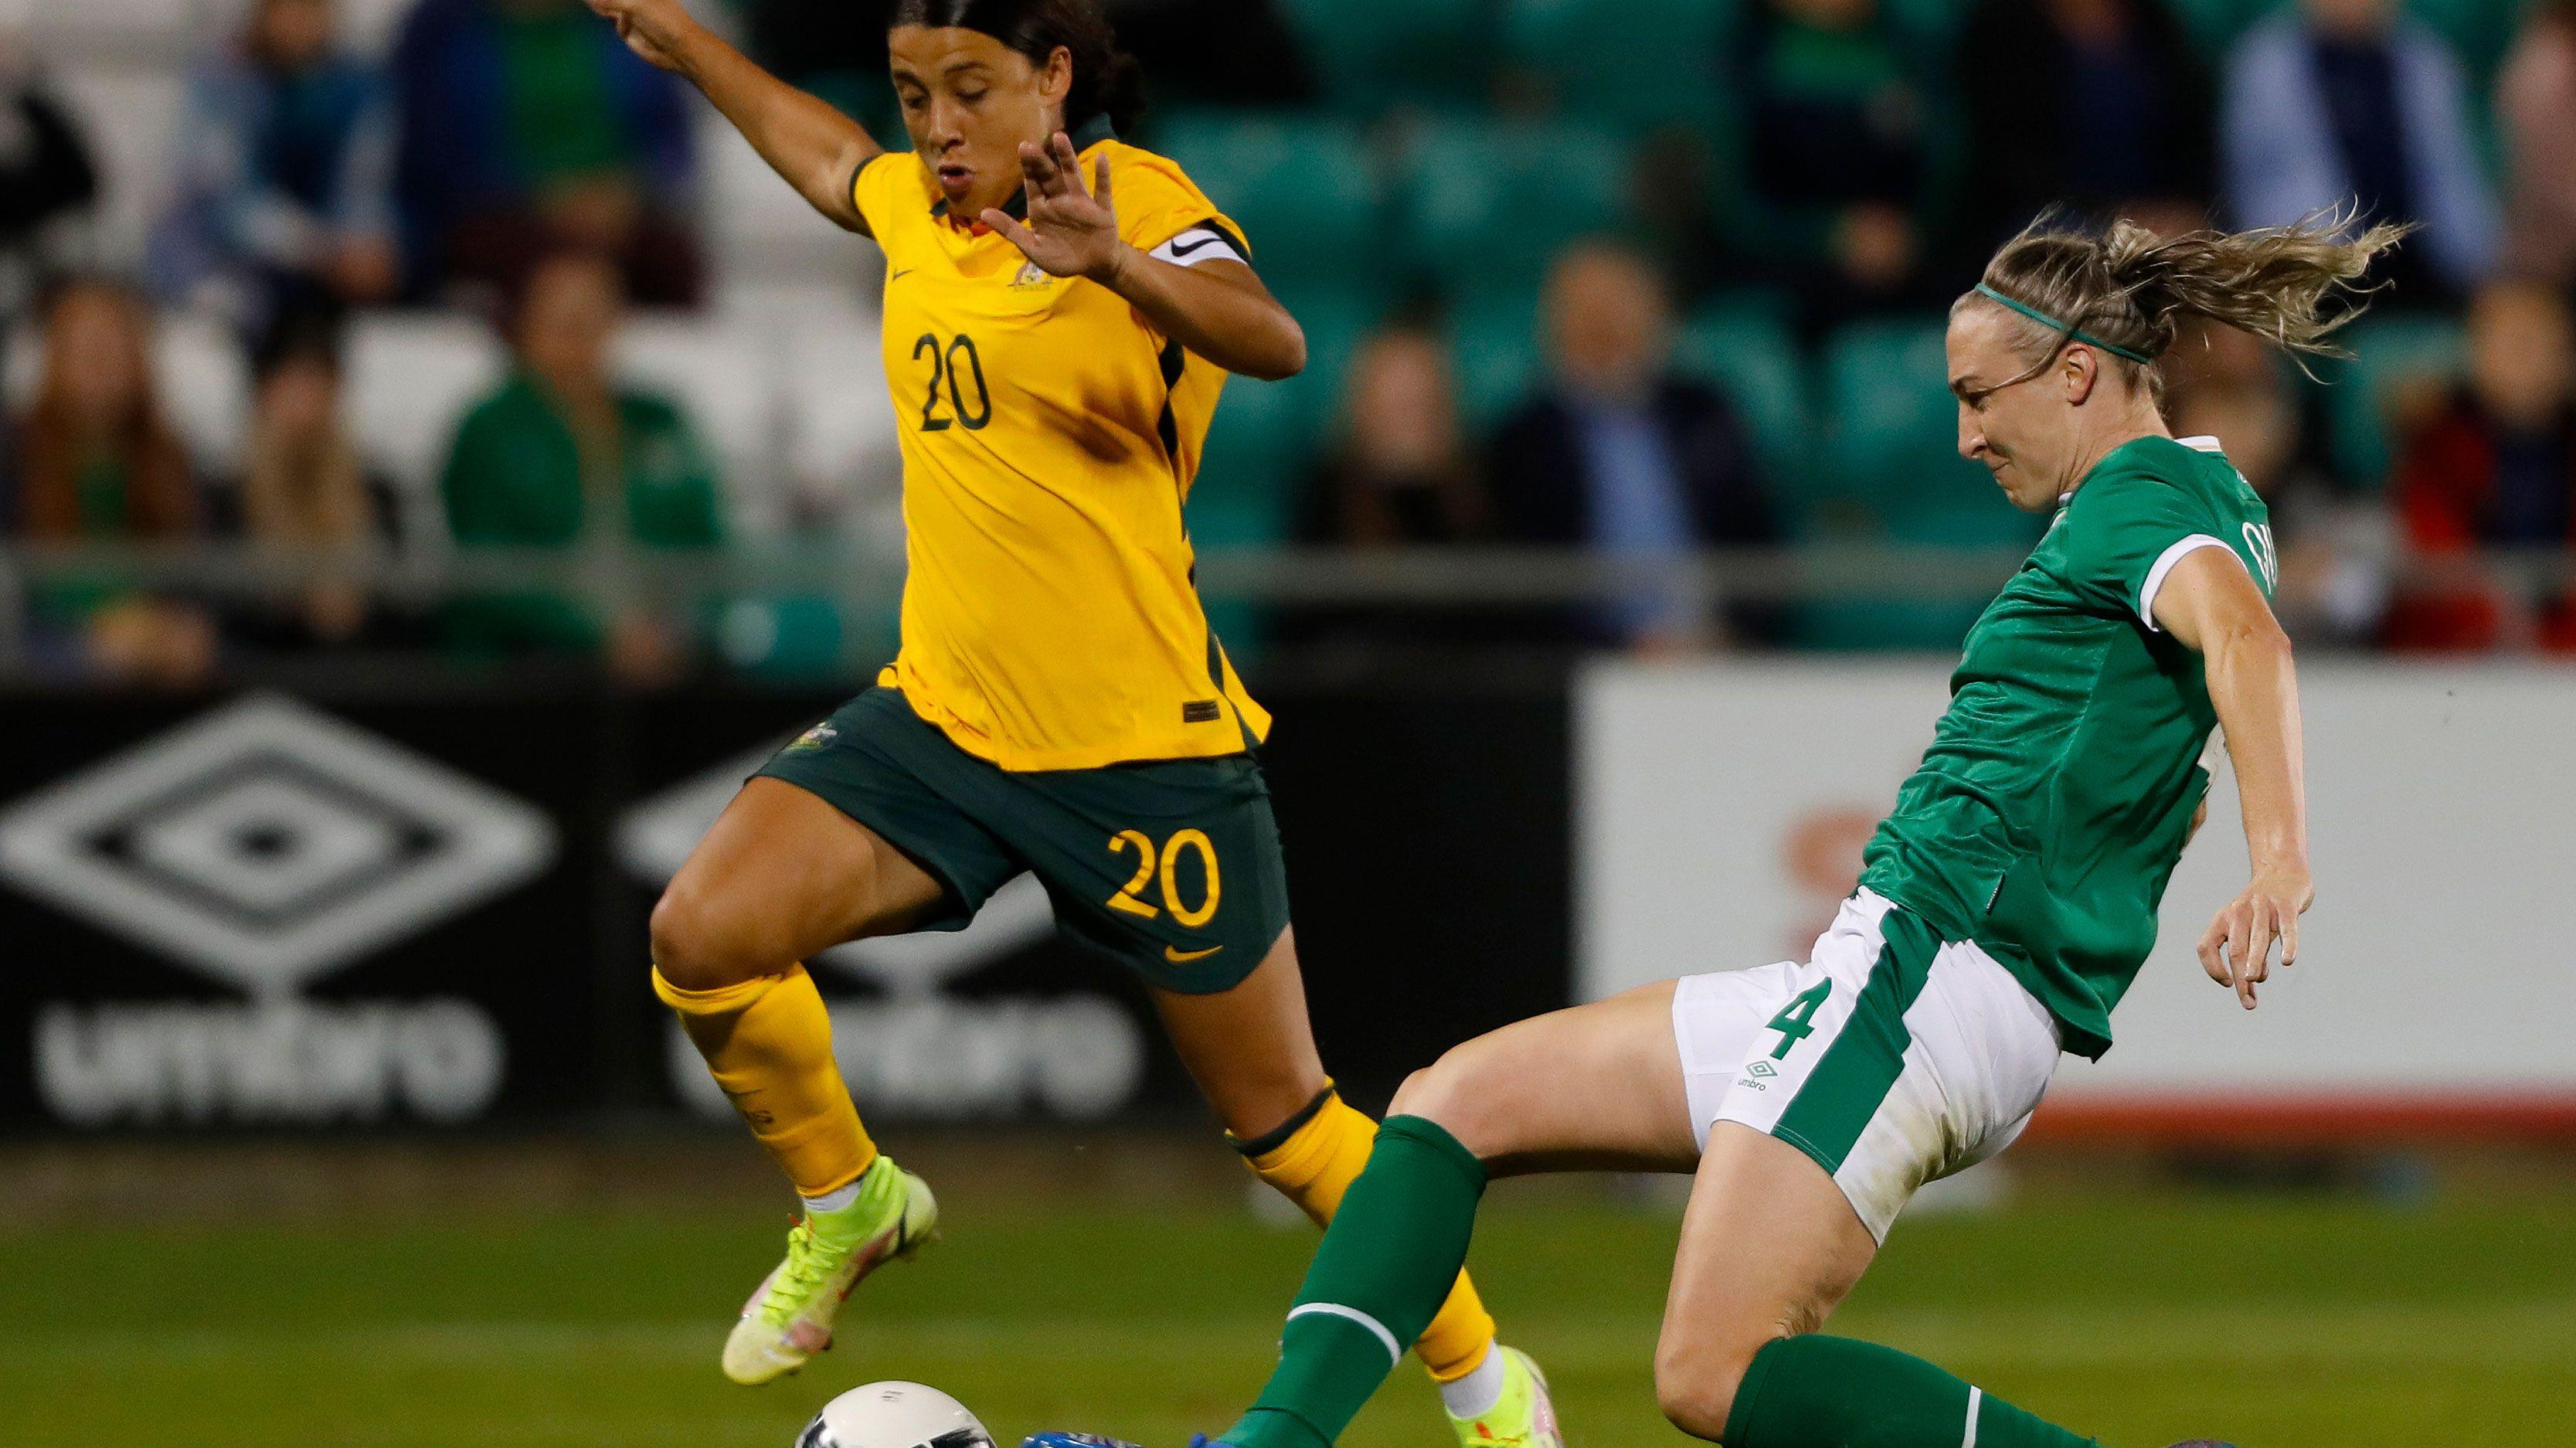 Sam Kerr's super milestone ends in defeat as Matildas go down to Republic of Ireland